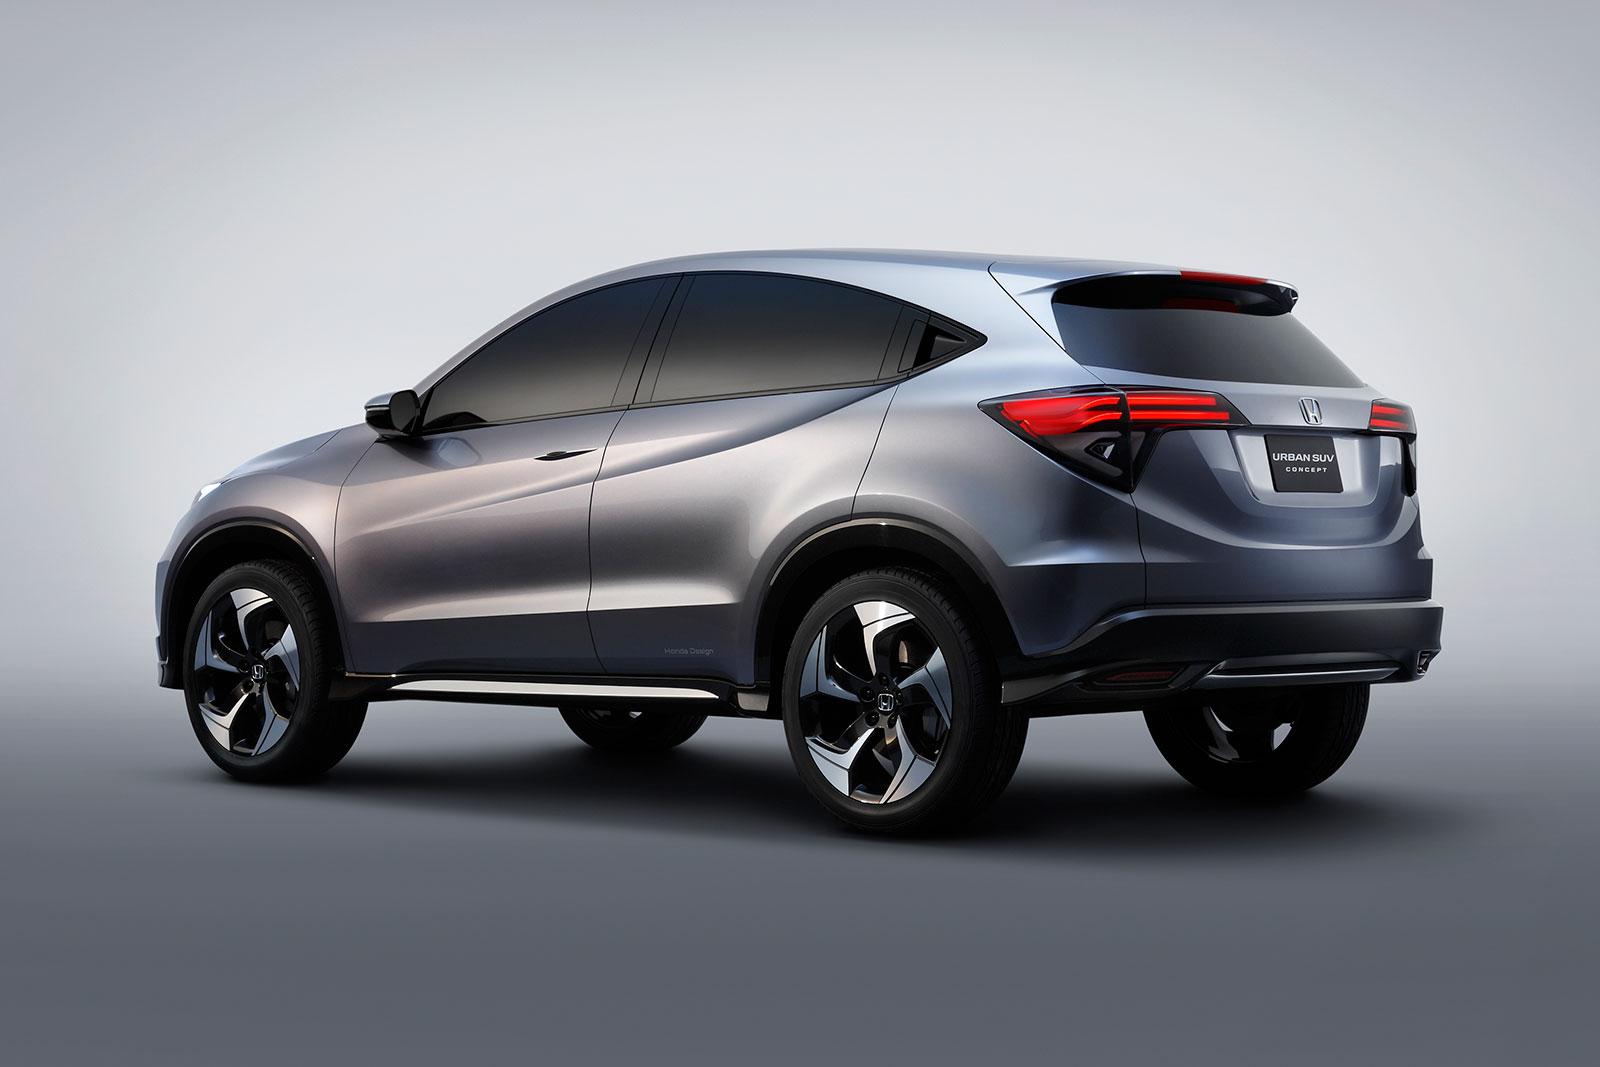 Honda Urban Suv Concepts